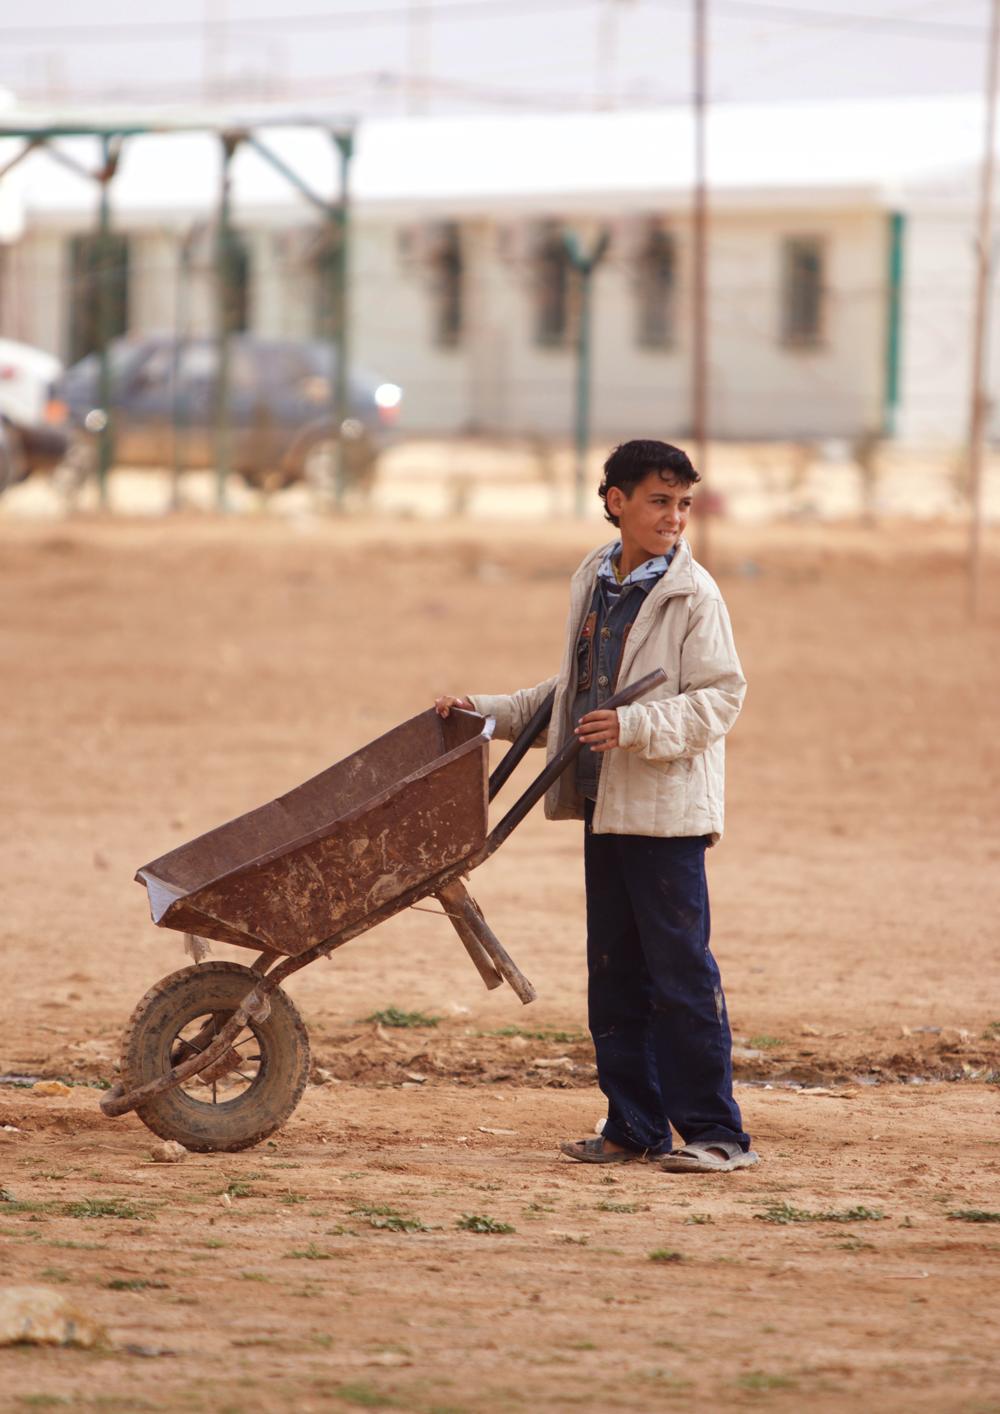 Syrian boy holding wheelbarrow